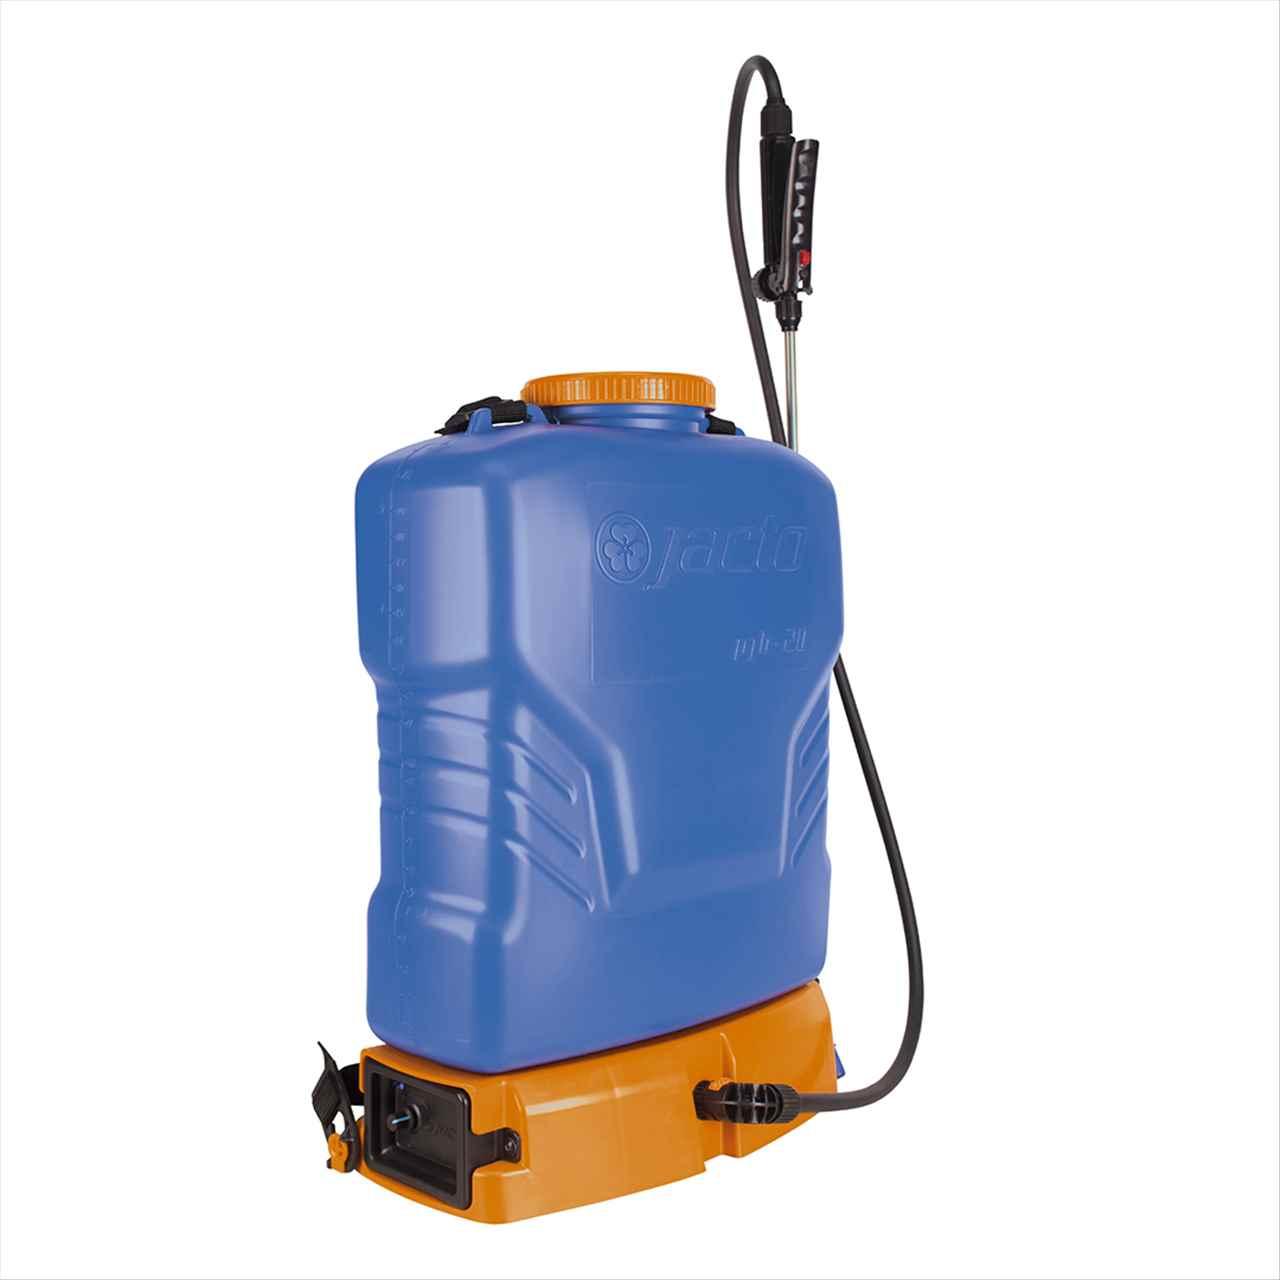 rondonopolis%2fmt%2fpjb-20-pulverizador-costal-a-bateria-20l%2c-marca-jacto%2f1252084%2fequipamentos%2fguimaquina-implementos-agricolas---jacto%2f11899